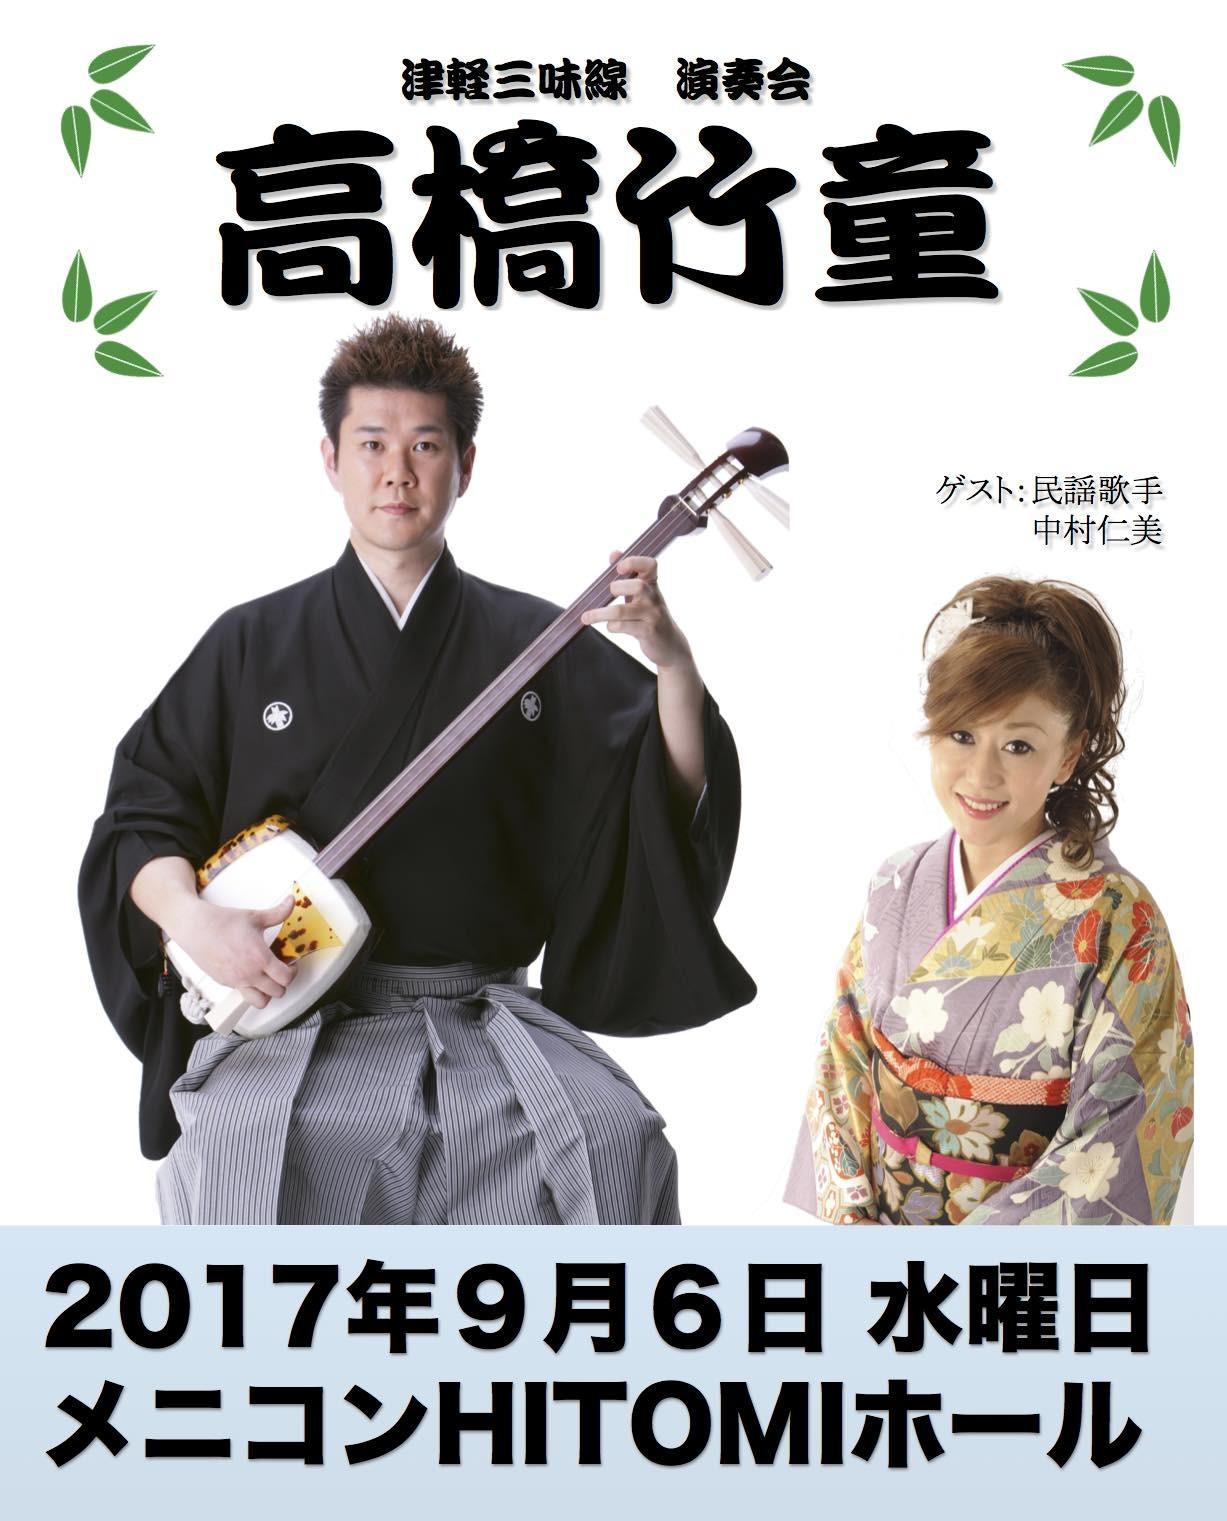 chiku2017-aki.jpg